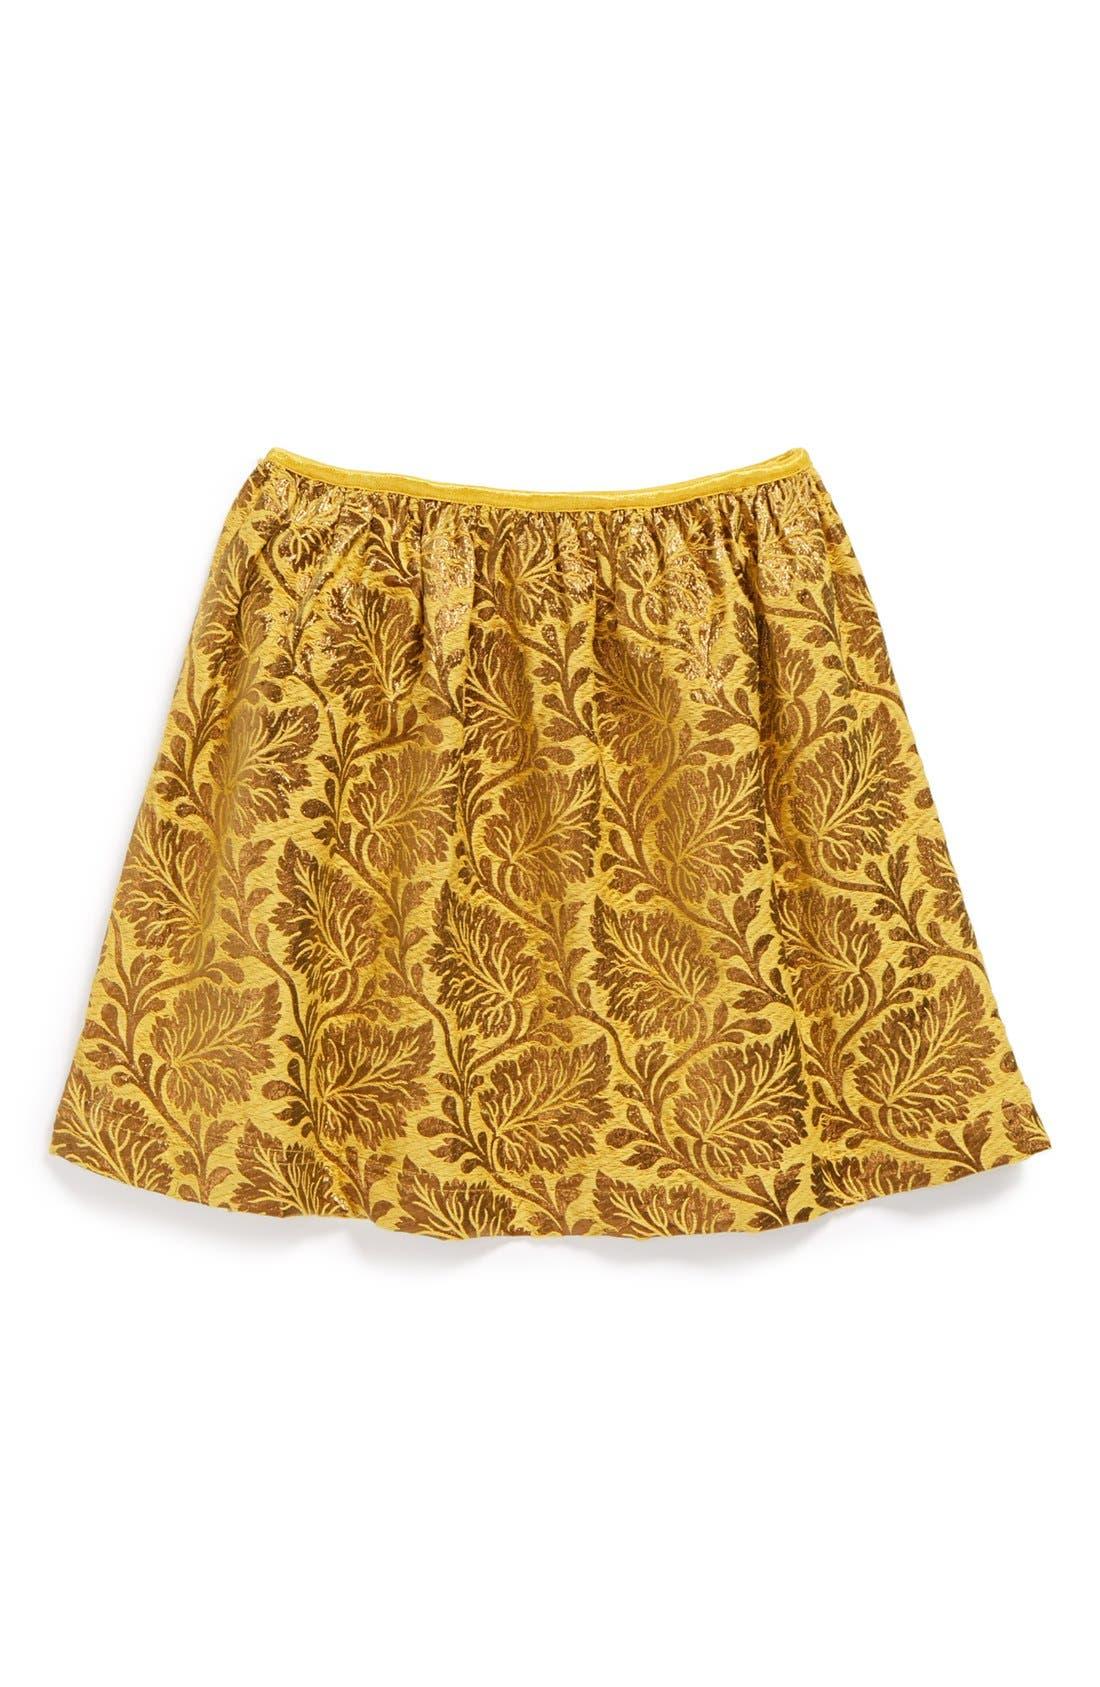 Alternate Image 1 Selected - Peek 'Nina' Skirt (Big Girls)